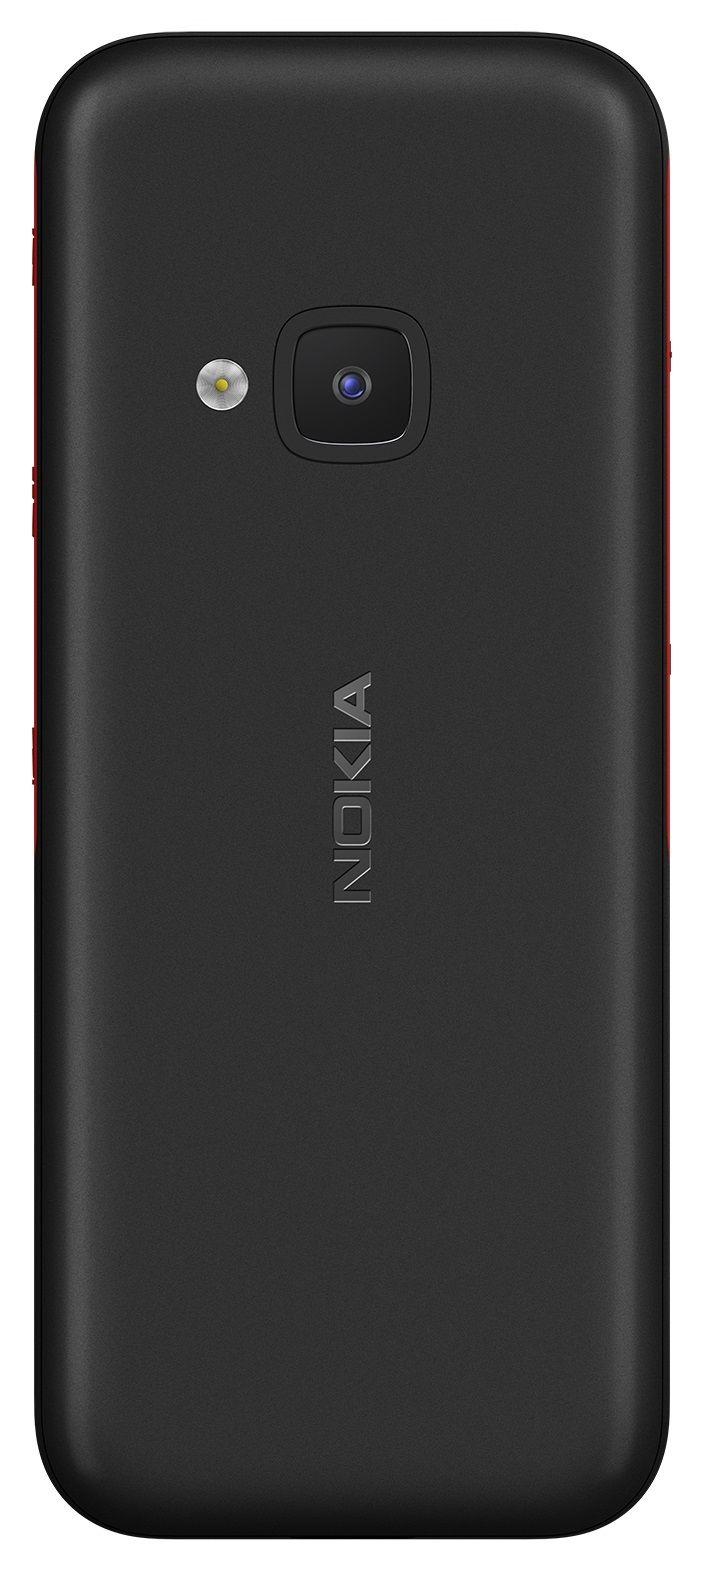 Мобильный телефон Nokia 5310 2020 DualSim Black/Red от Територія твоєї техніки - 2